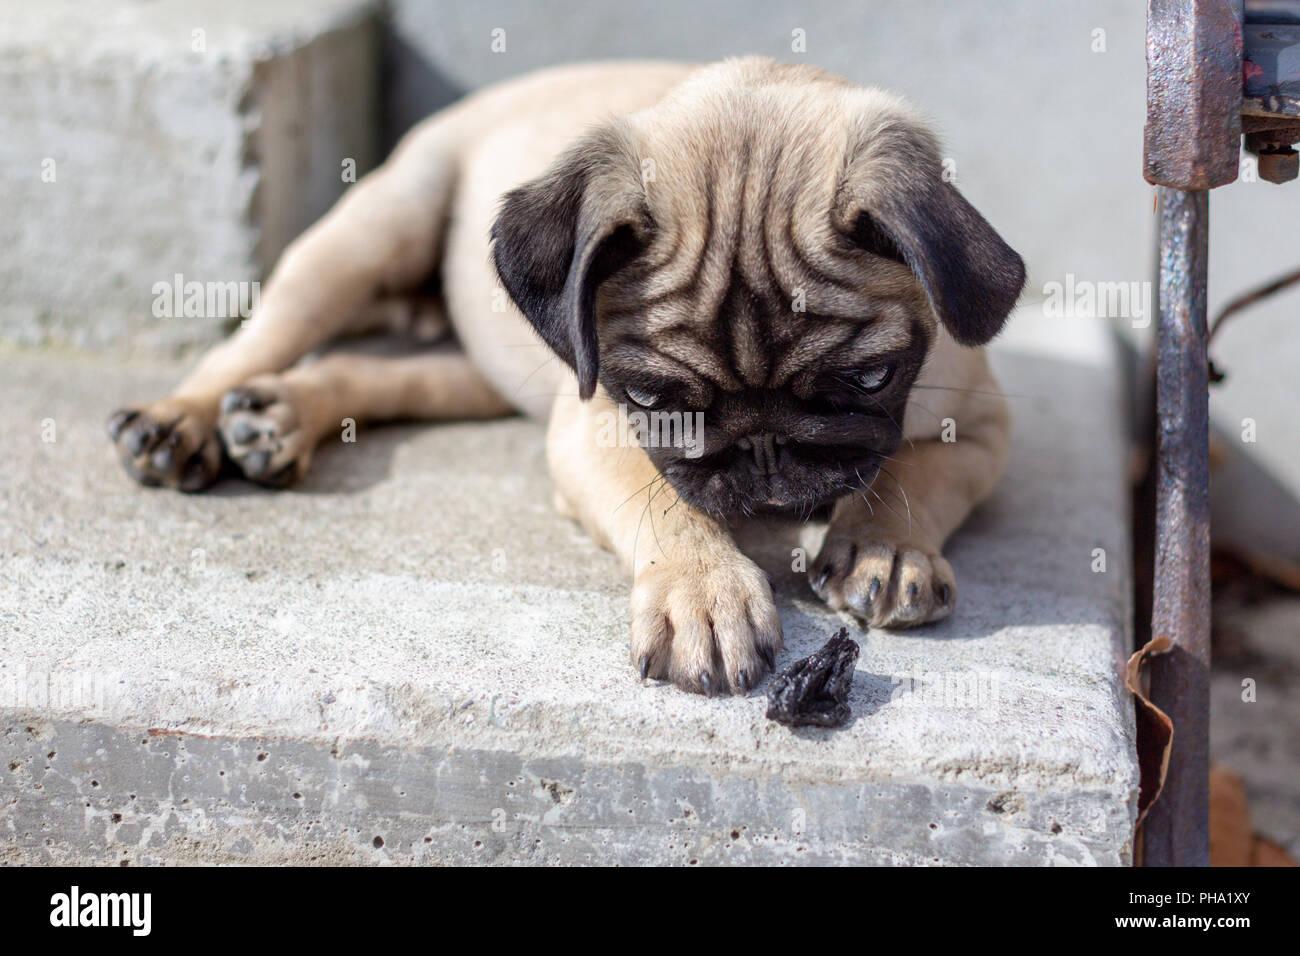 Cute Pug Puppy at play Stock Photo